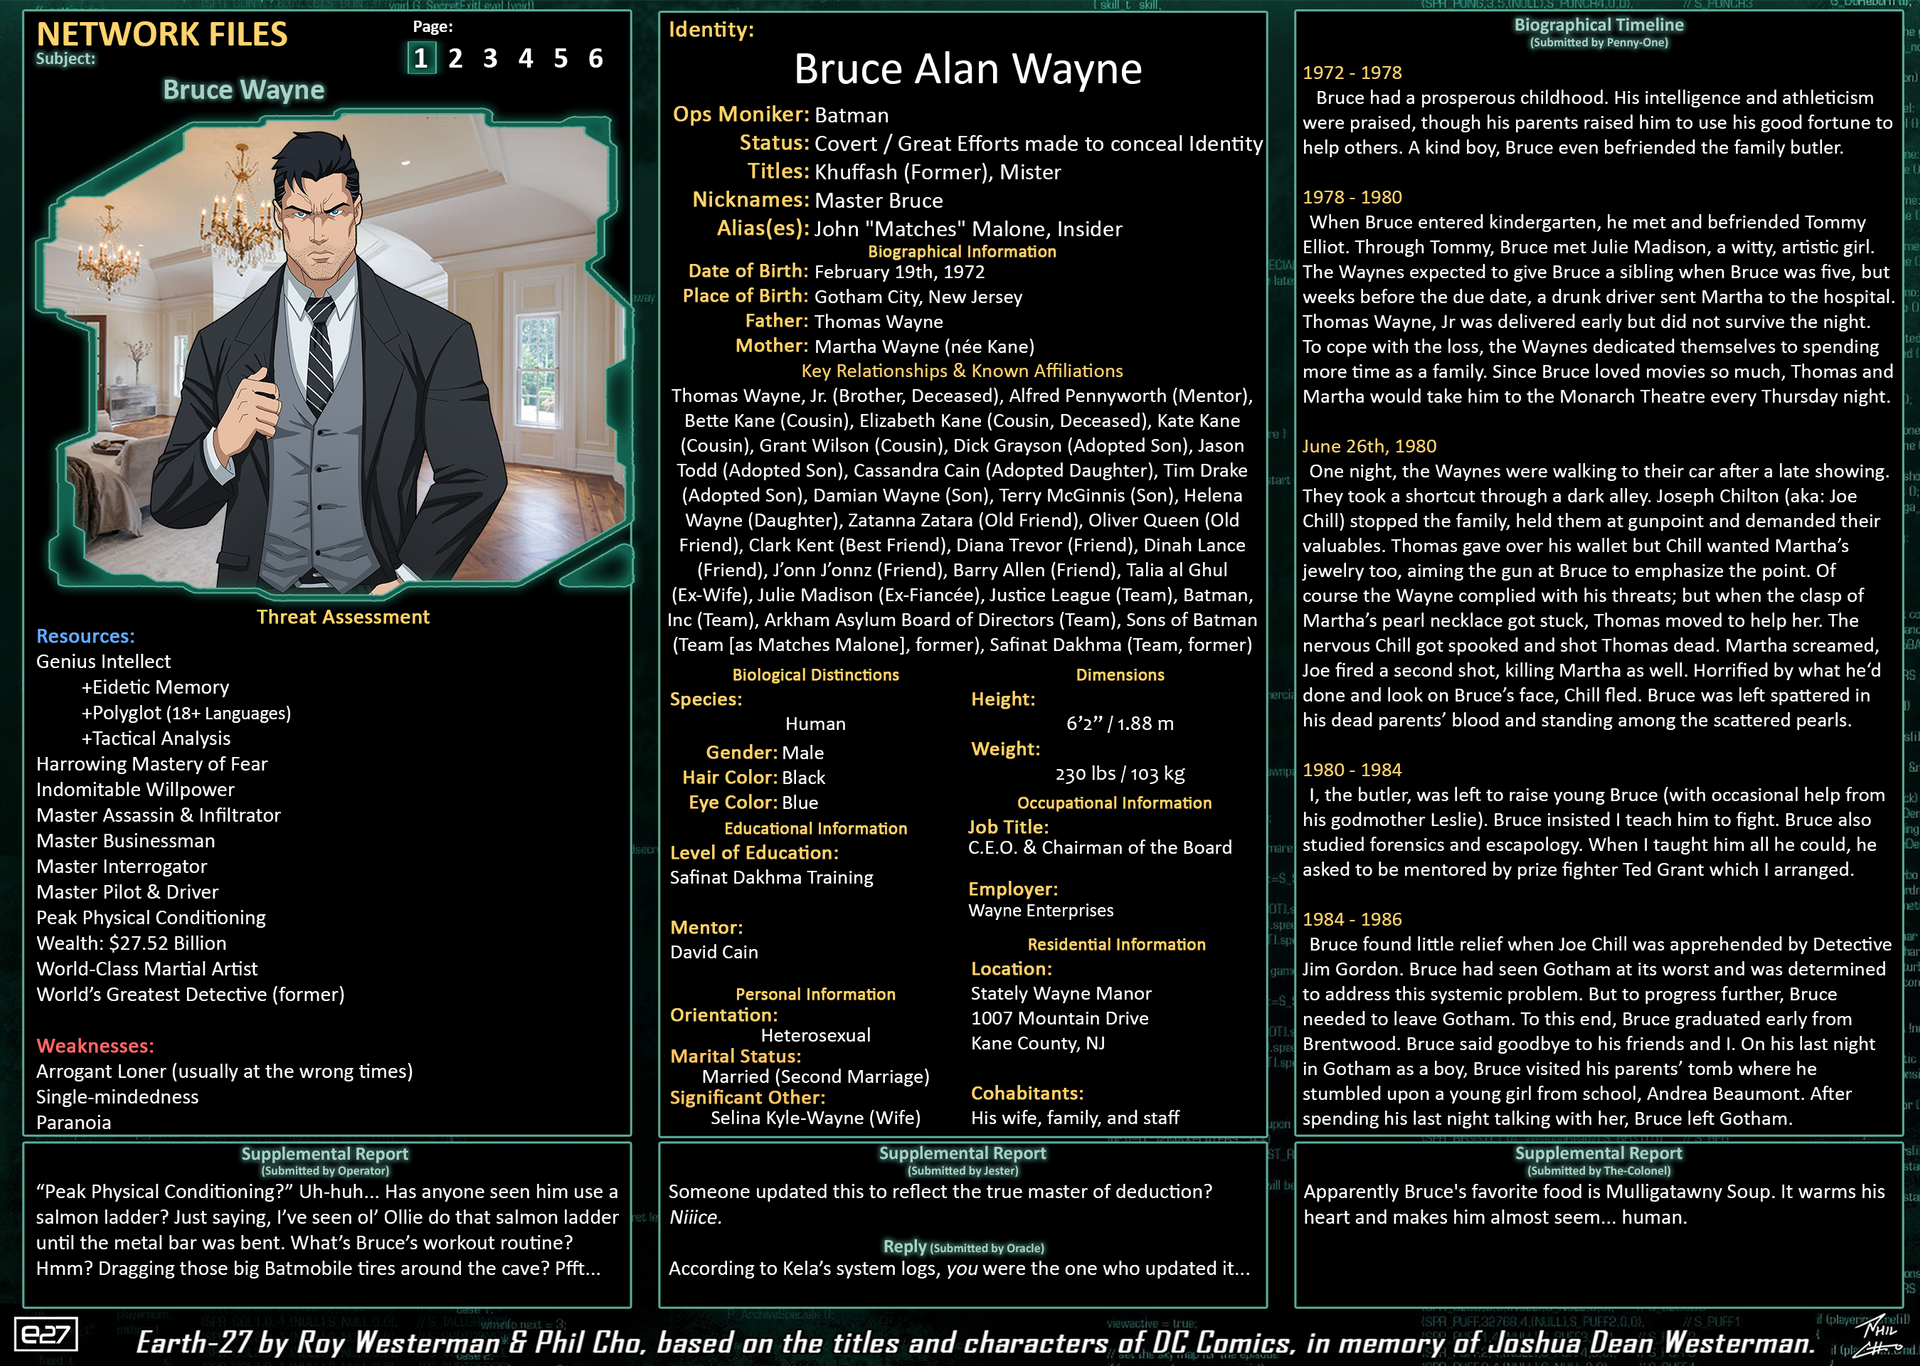 Network Files - Bruce Wayne 1